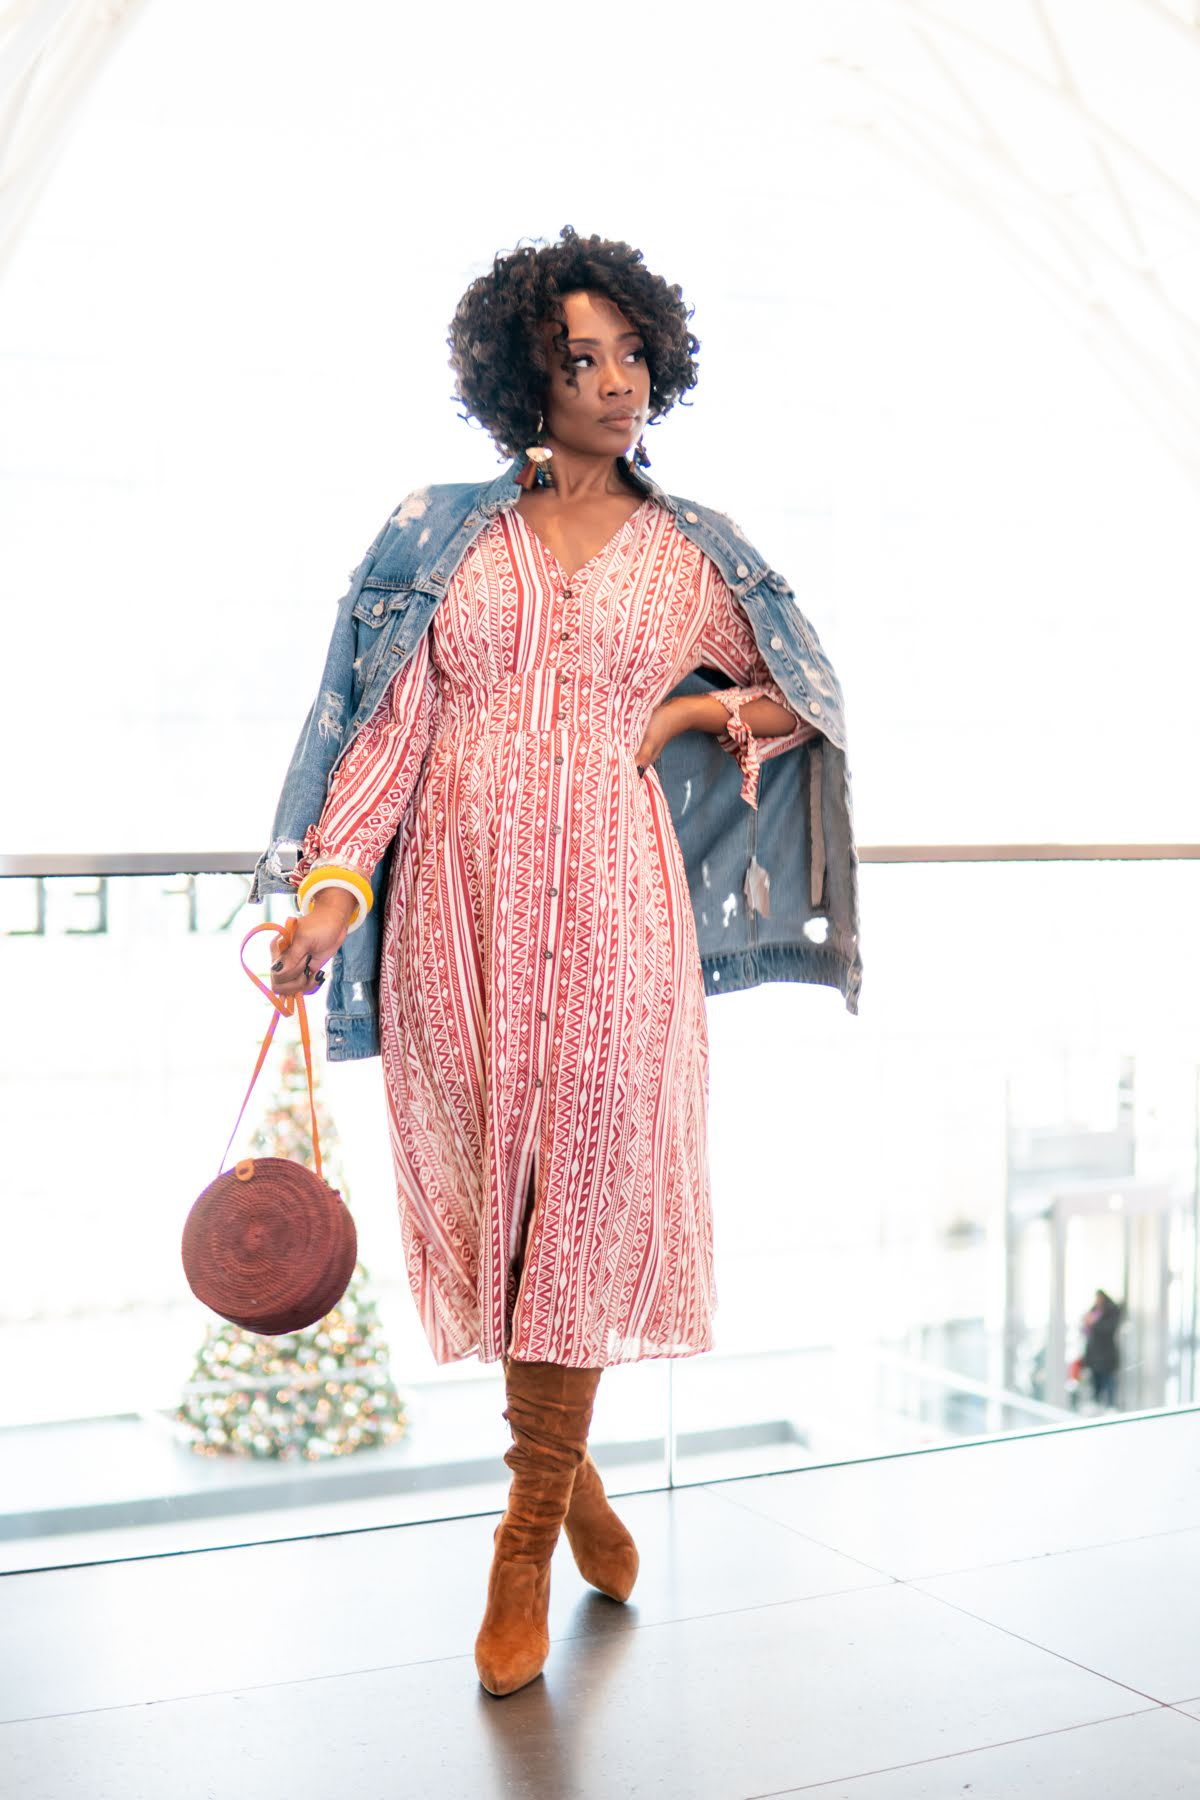 dress:  https://www.shoppinkblush.com/p-44838-yellow-printed-long-sleeve-button-up-midi-dress.aspx?DepartmentID=2  @shoppinkblush on Insta; www.shoppinkblush.com)